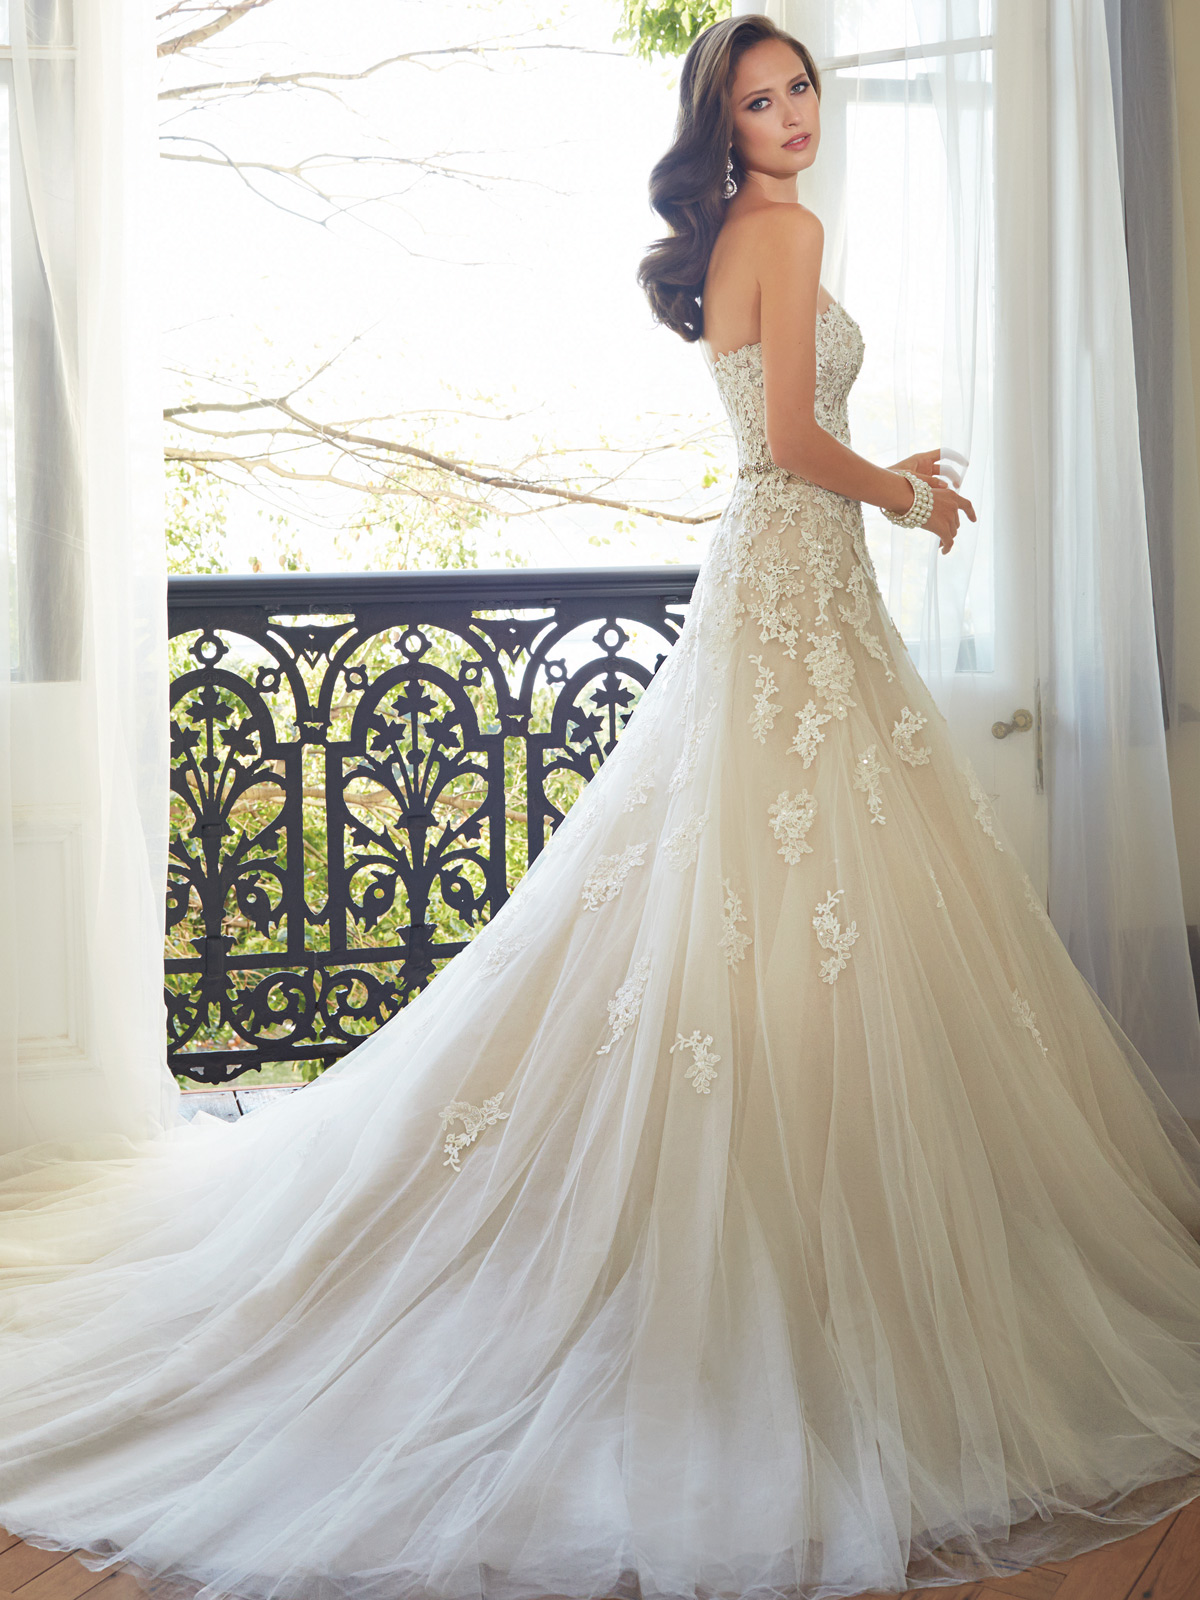 Wedding Dress Www.wedding Dresses 2015 wedding dresses southampton hampshire y11552 back designer 2015 robin 11737987 10152883137661205 5147846135981851778 n